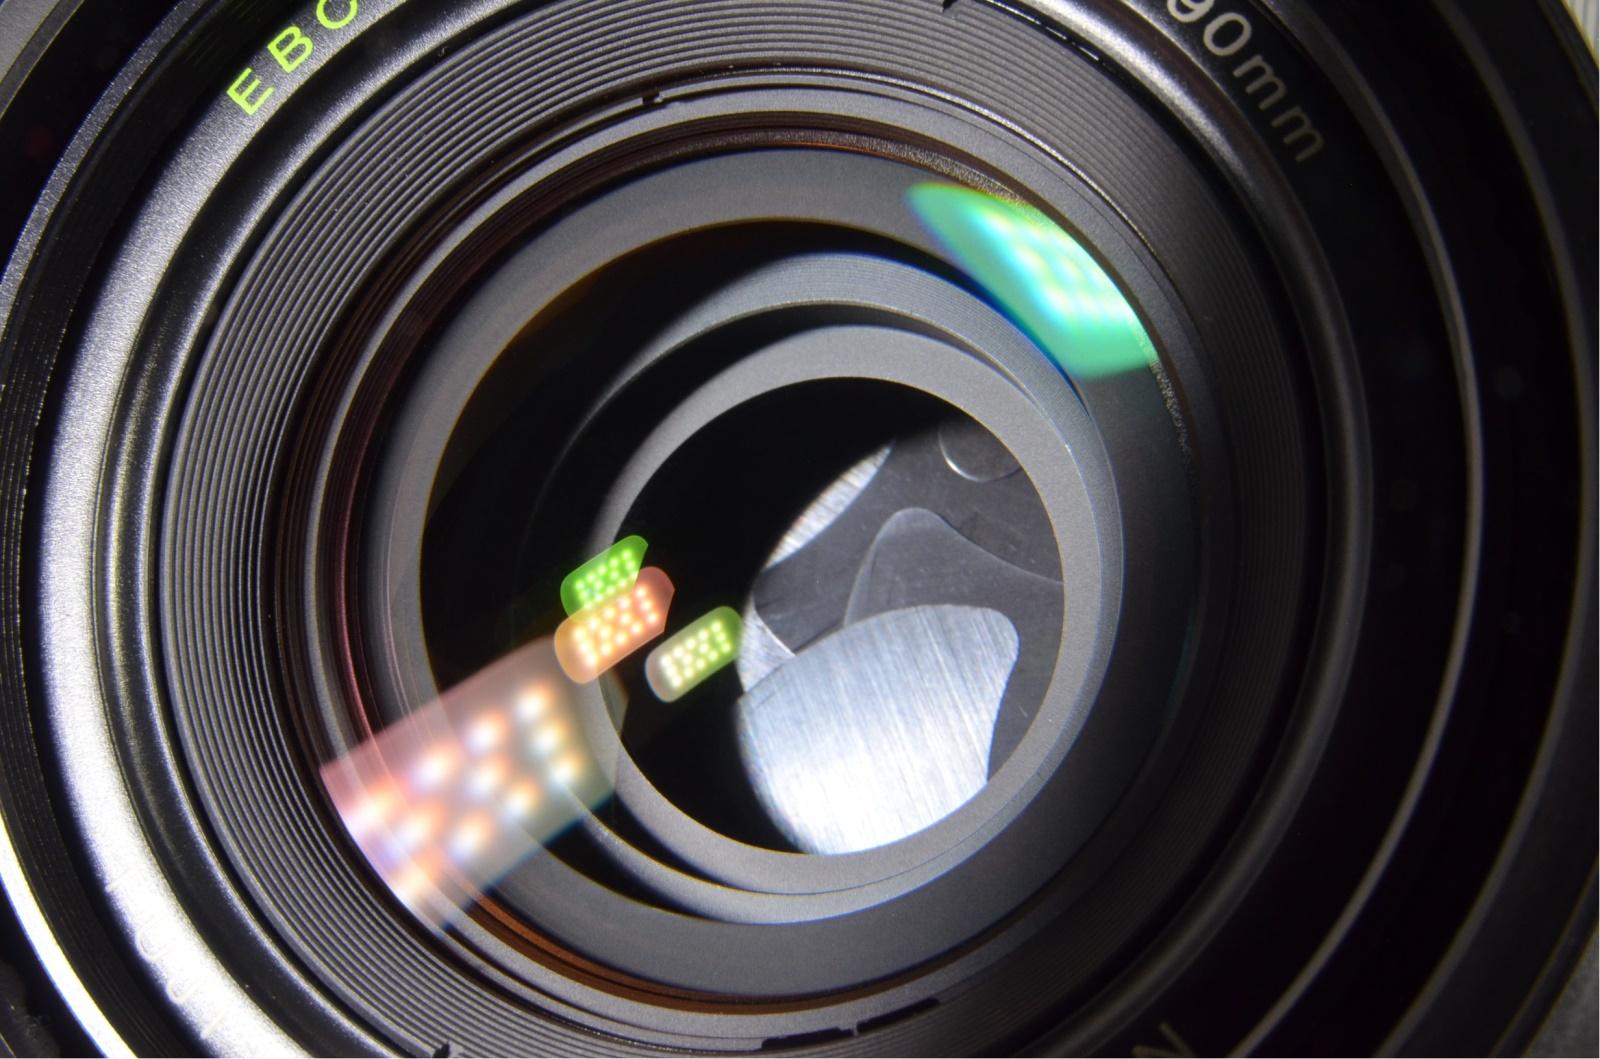 fuji fujifilm gw690iii 90mm f3.5 count 032 medium format camera shooting tested